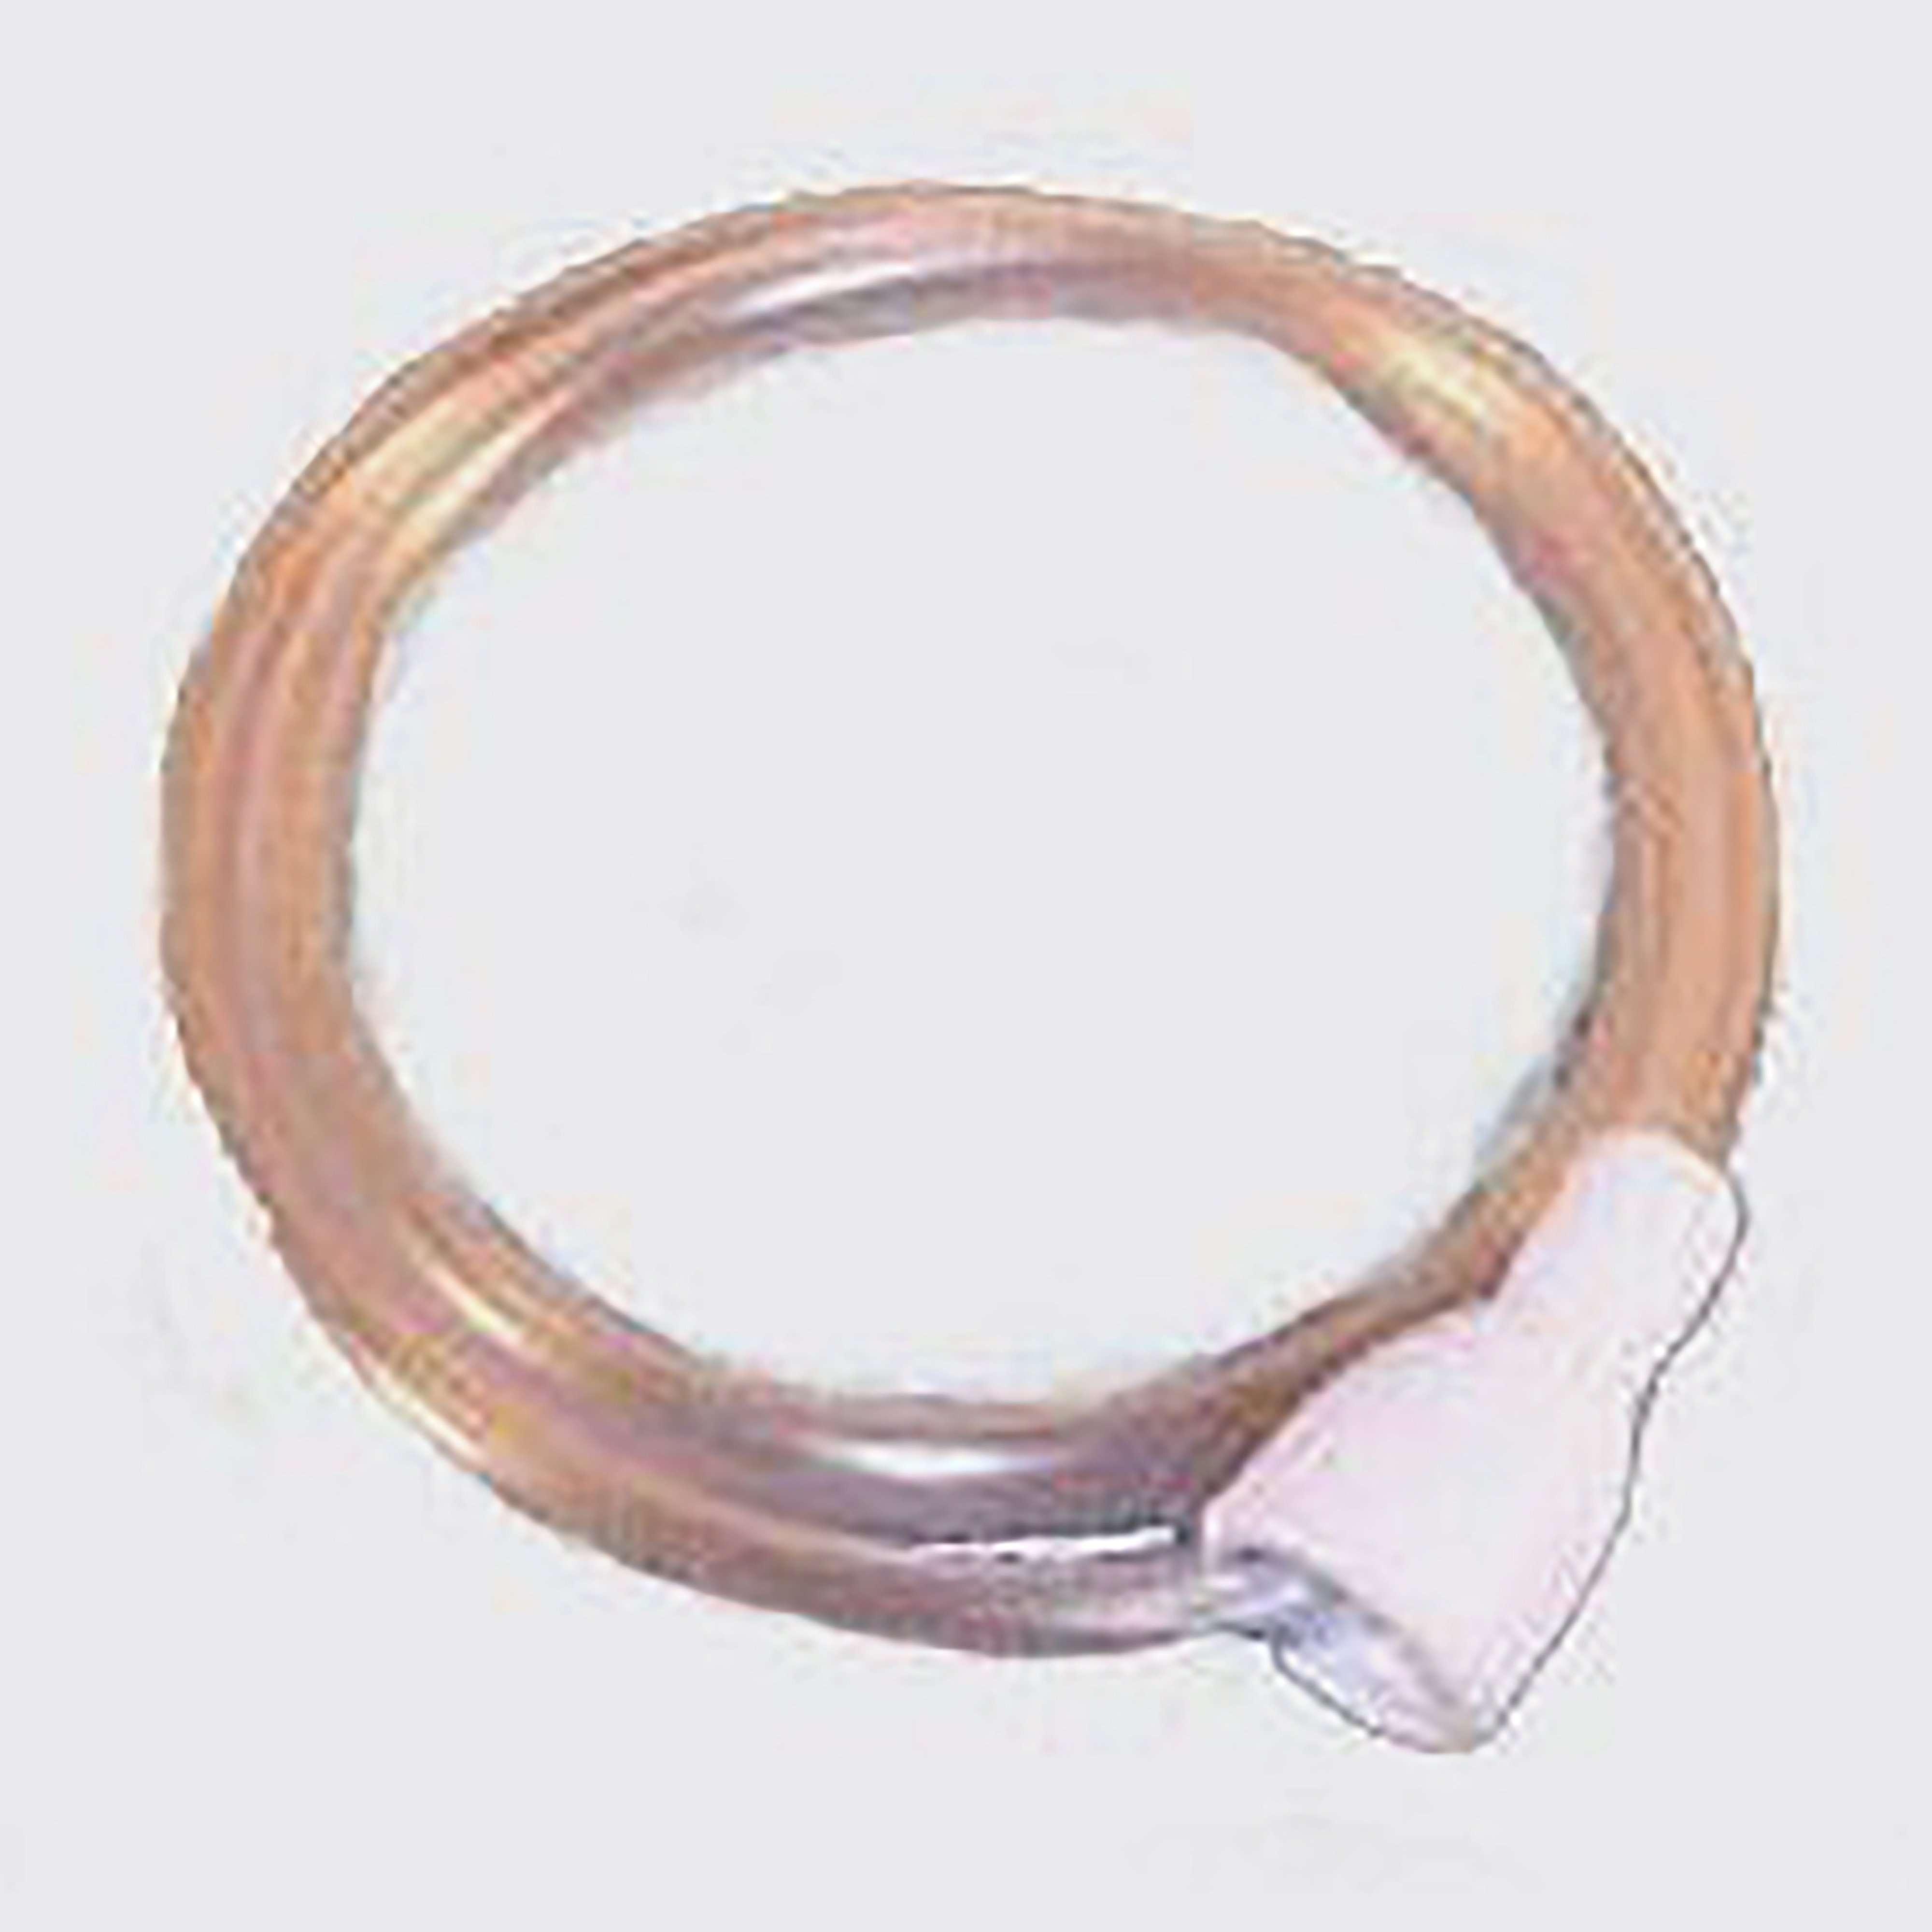 HITCHMAN Aquaroll Filler Tube